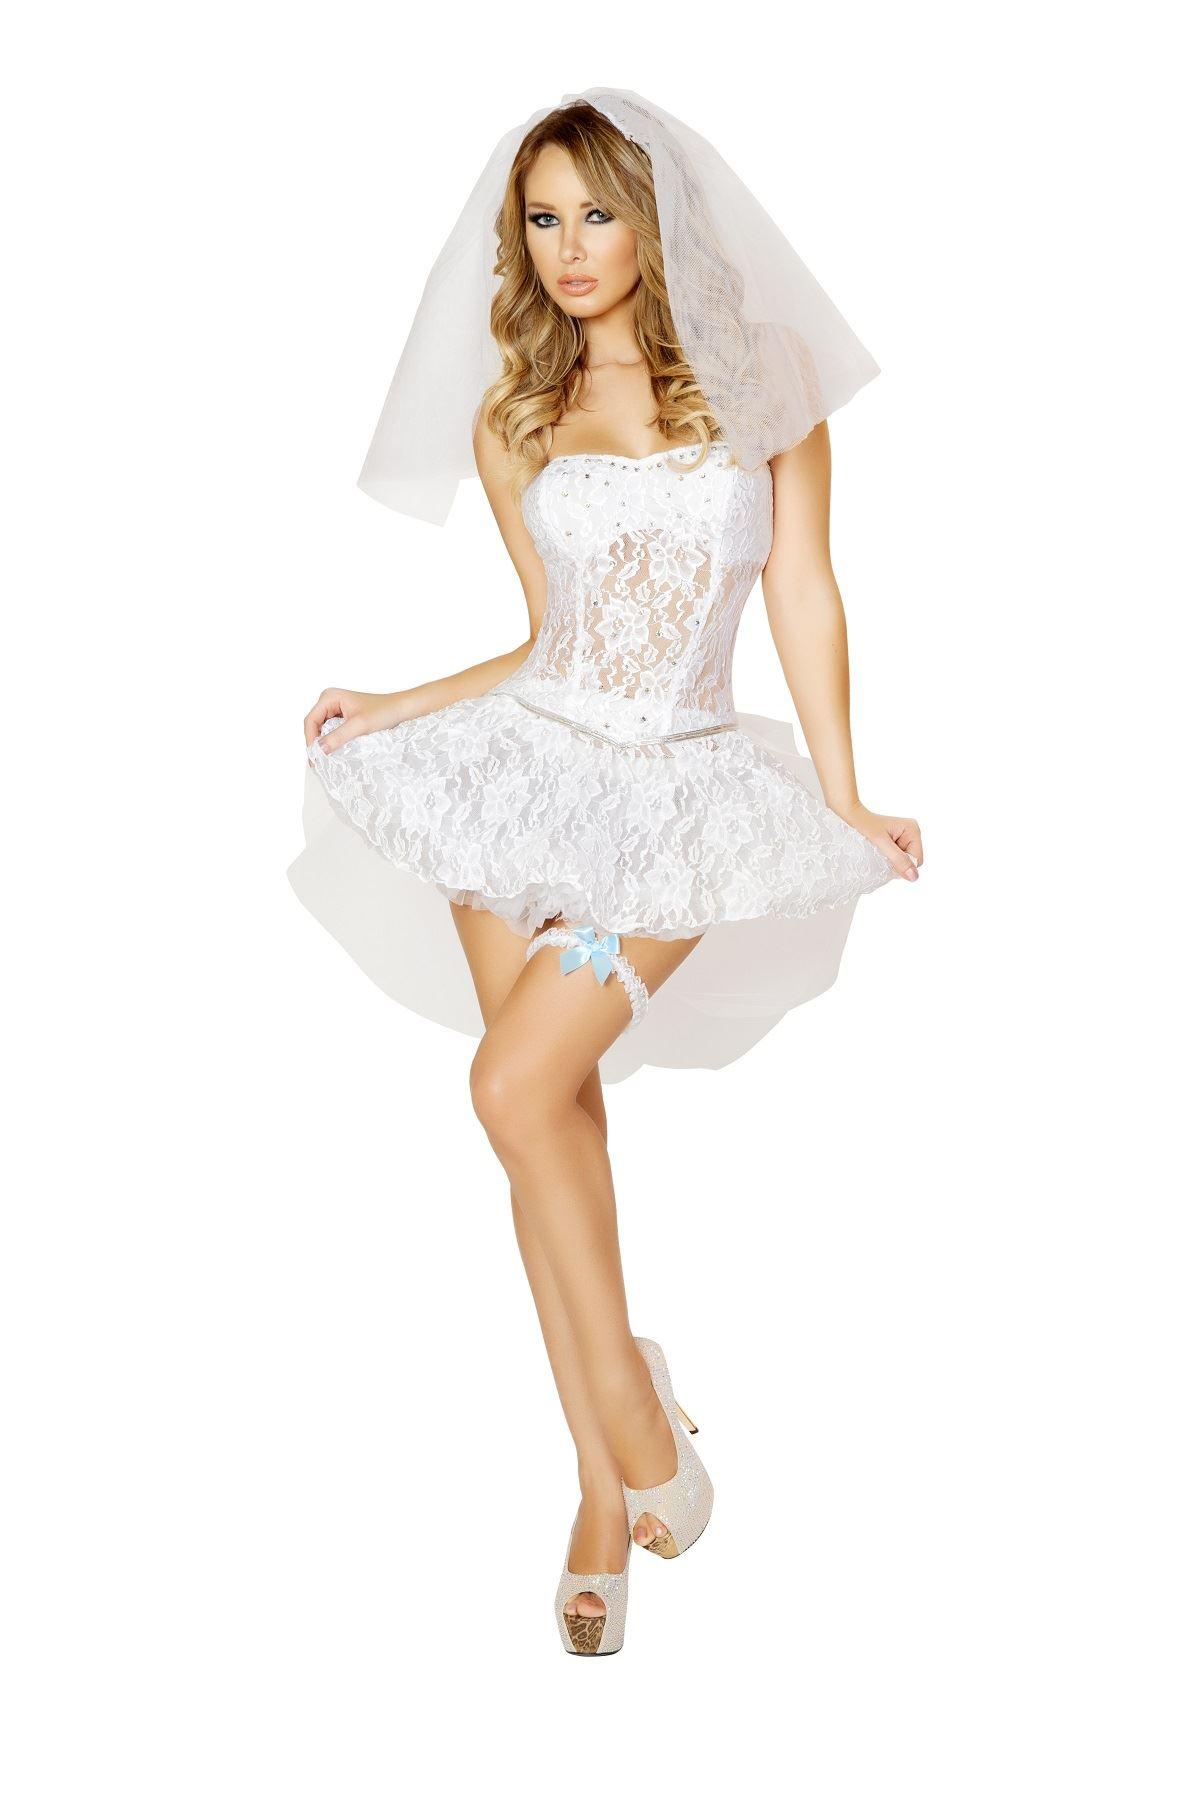 Adult y Bride Newlywed Woman Costume $65 99